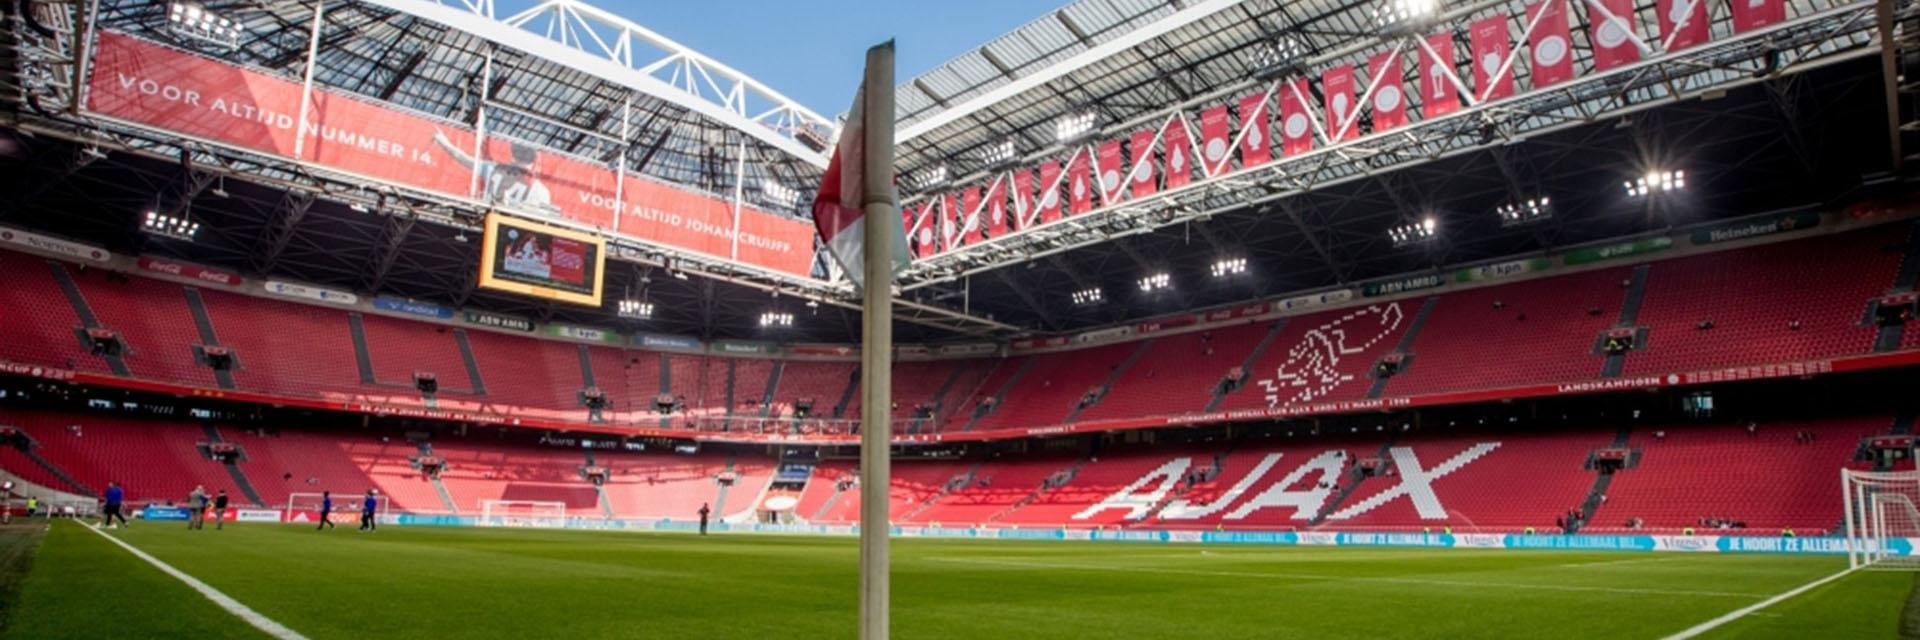 AFC Ajax - FC Utrecht, 0 Mayat 14:30